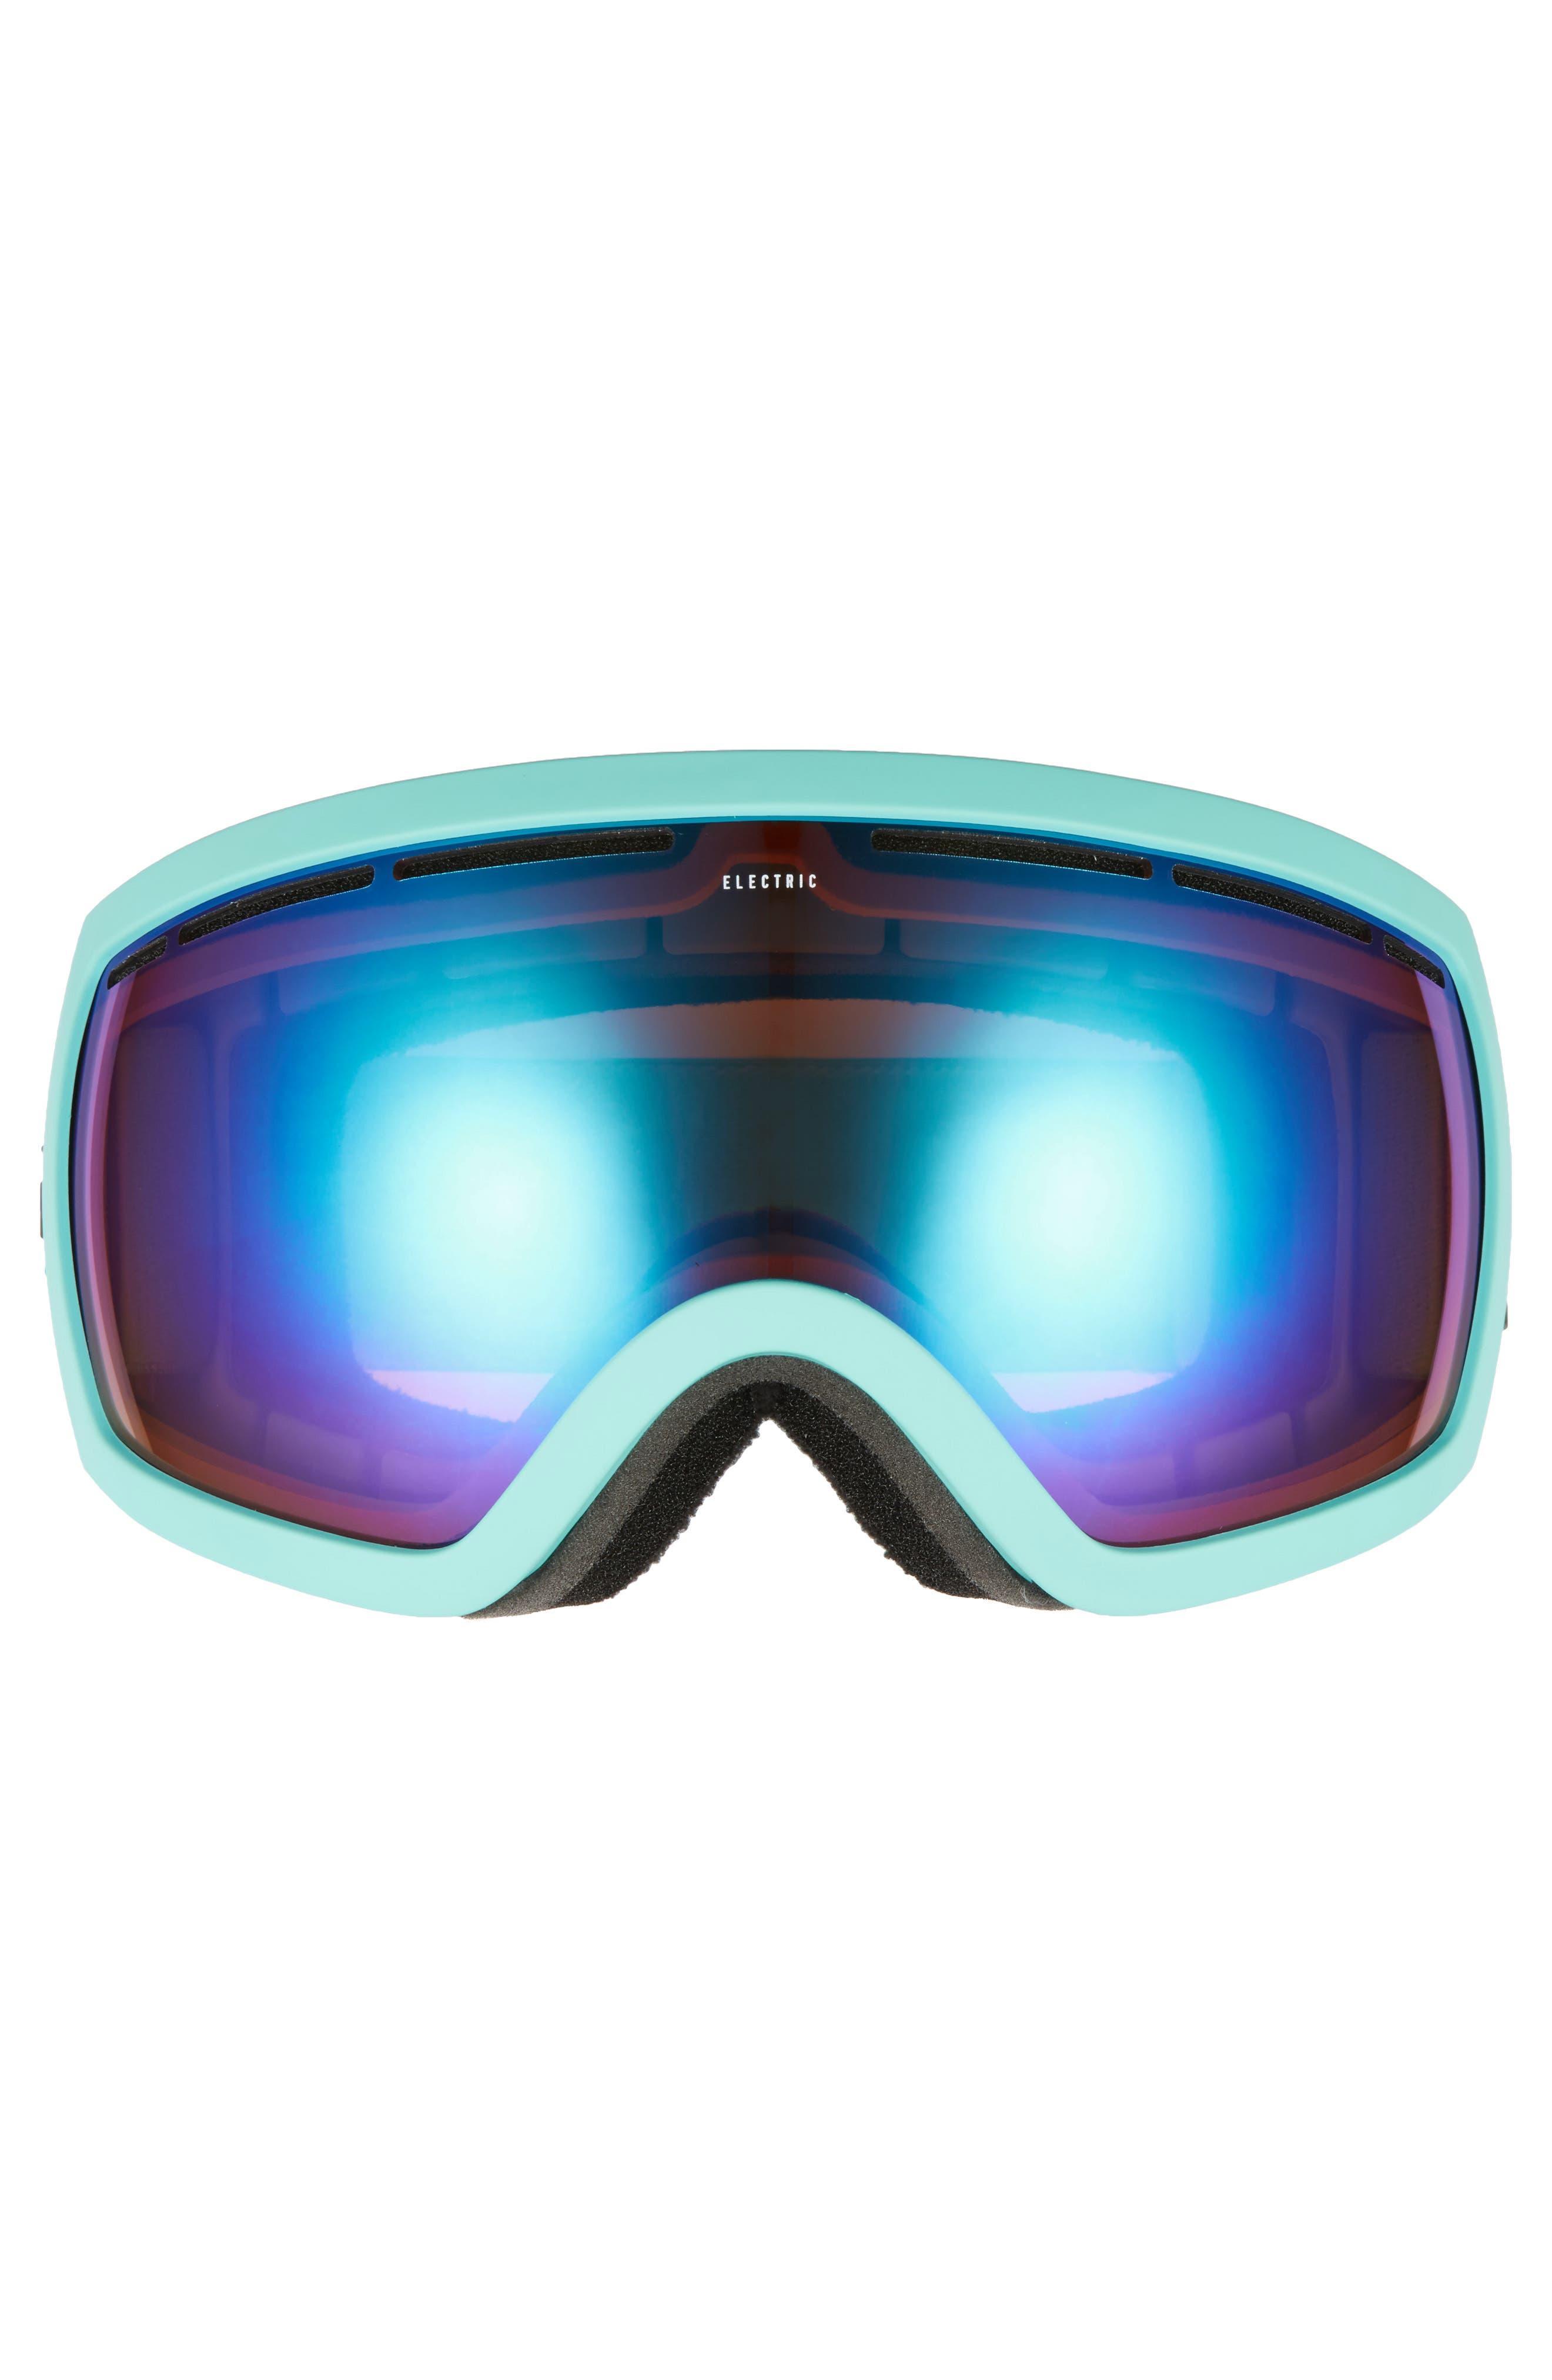 EG2.5 Snow Goggles,                             Alternate thumbnail 16, color,